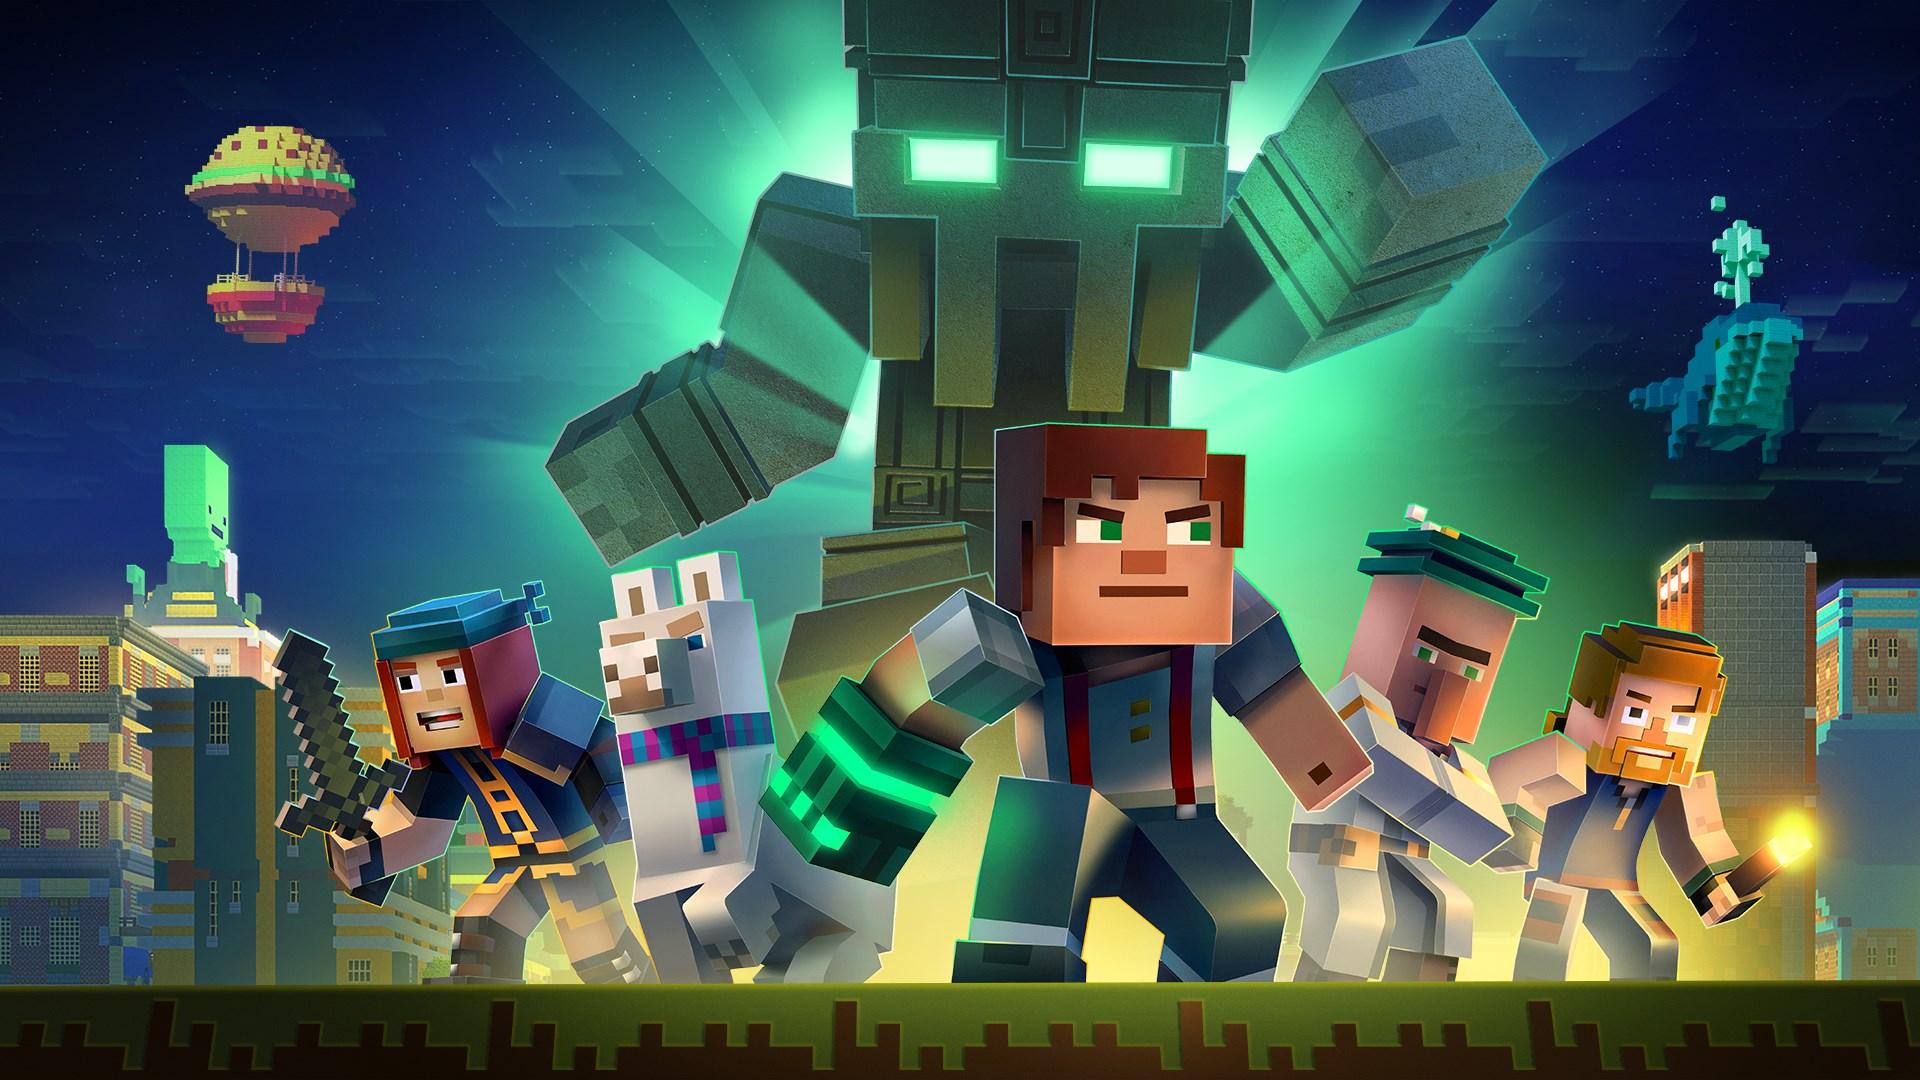 minecraft story mode season 2 free download pc